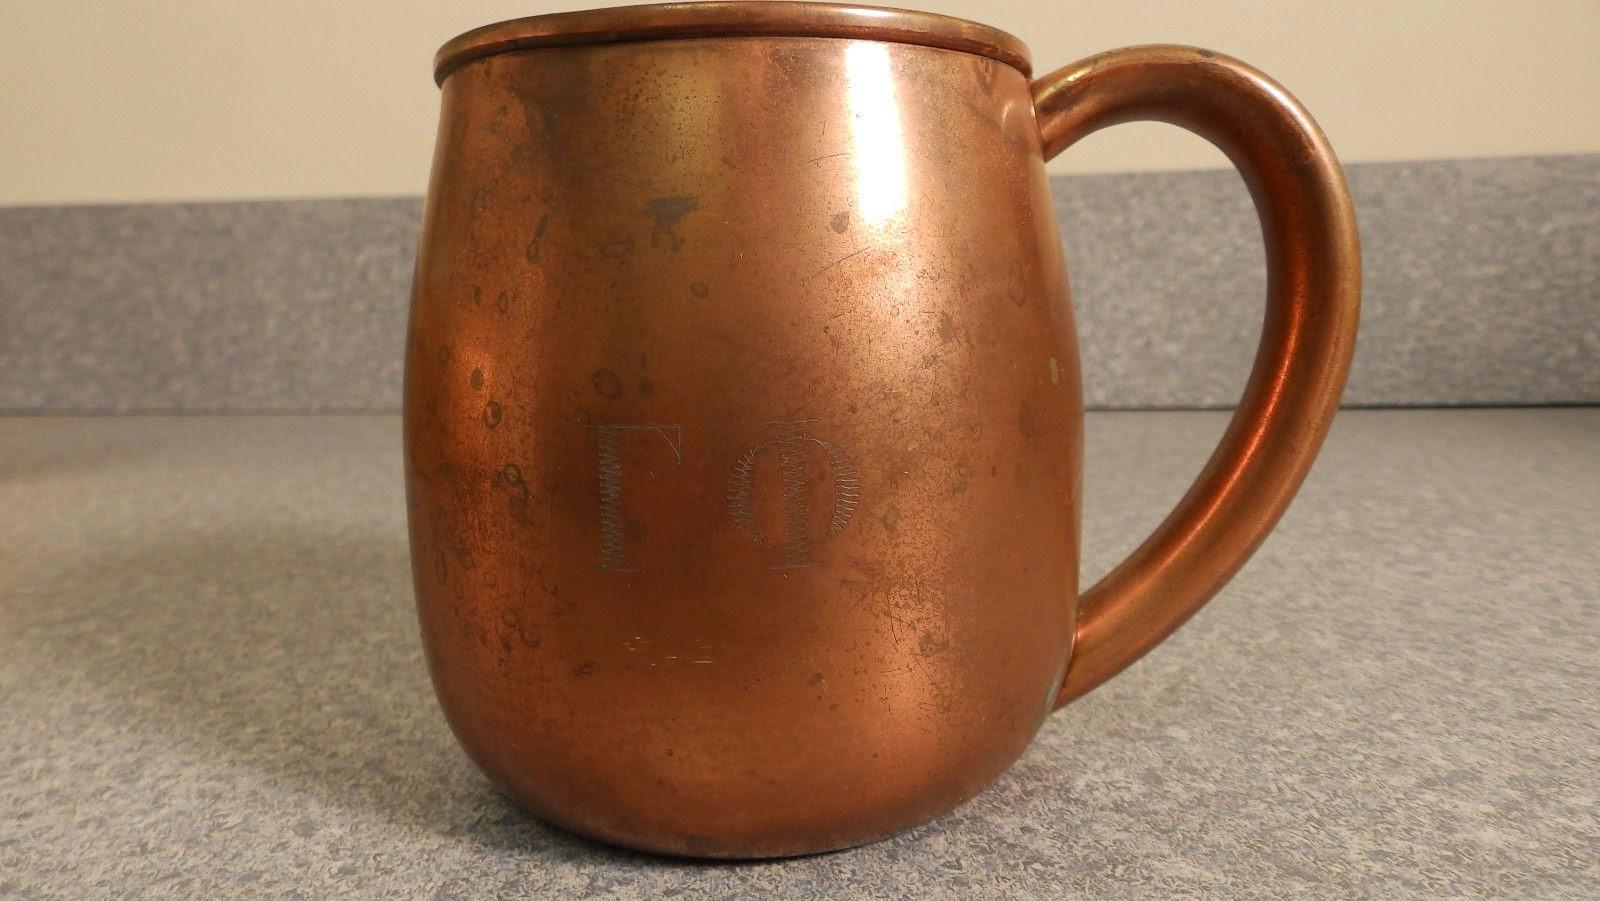 http://www.ebay.com/itm/Copper-Mule-Cup-Gamma-Phi-L-B-Balfour-Co-Attleboro-Mass-/321689699859?pt=LH_DefaultDomain_0&hash=item4ae6334613